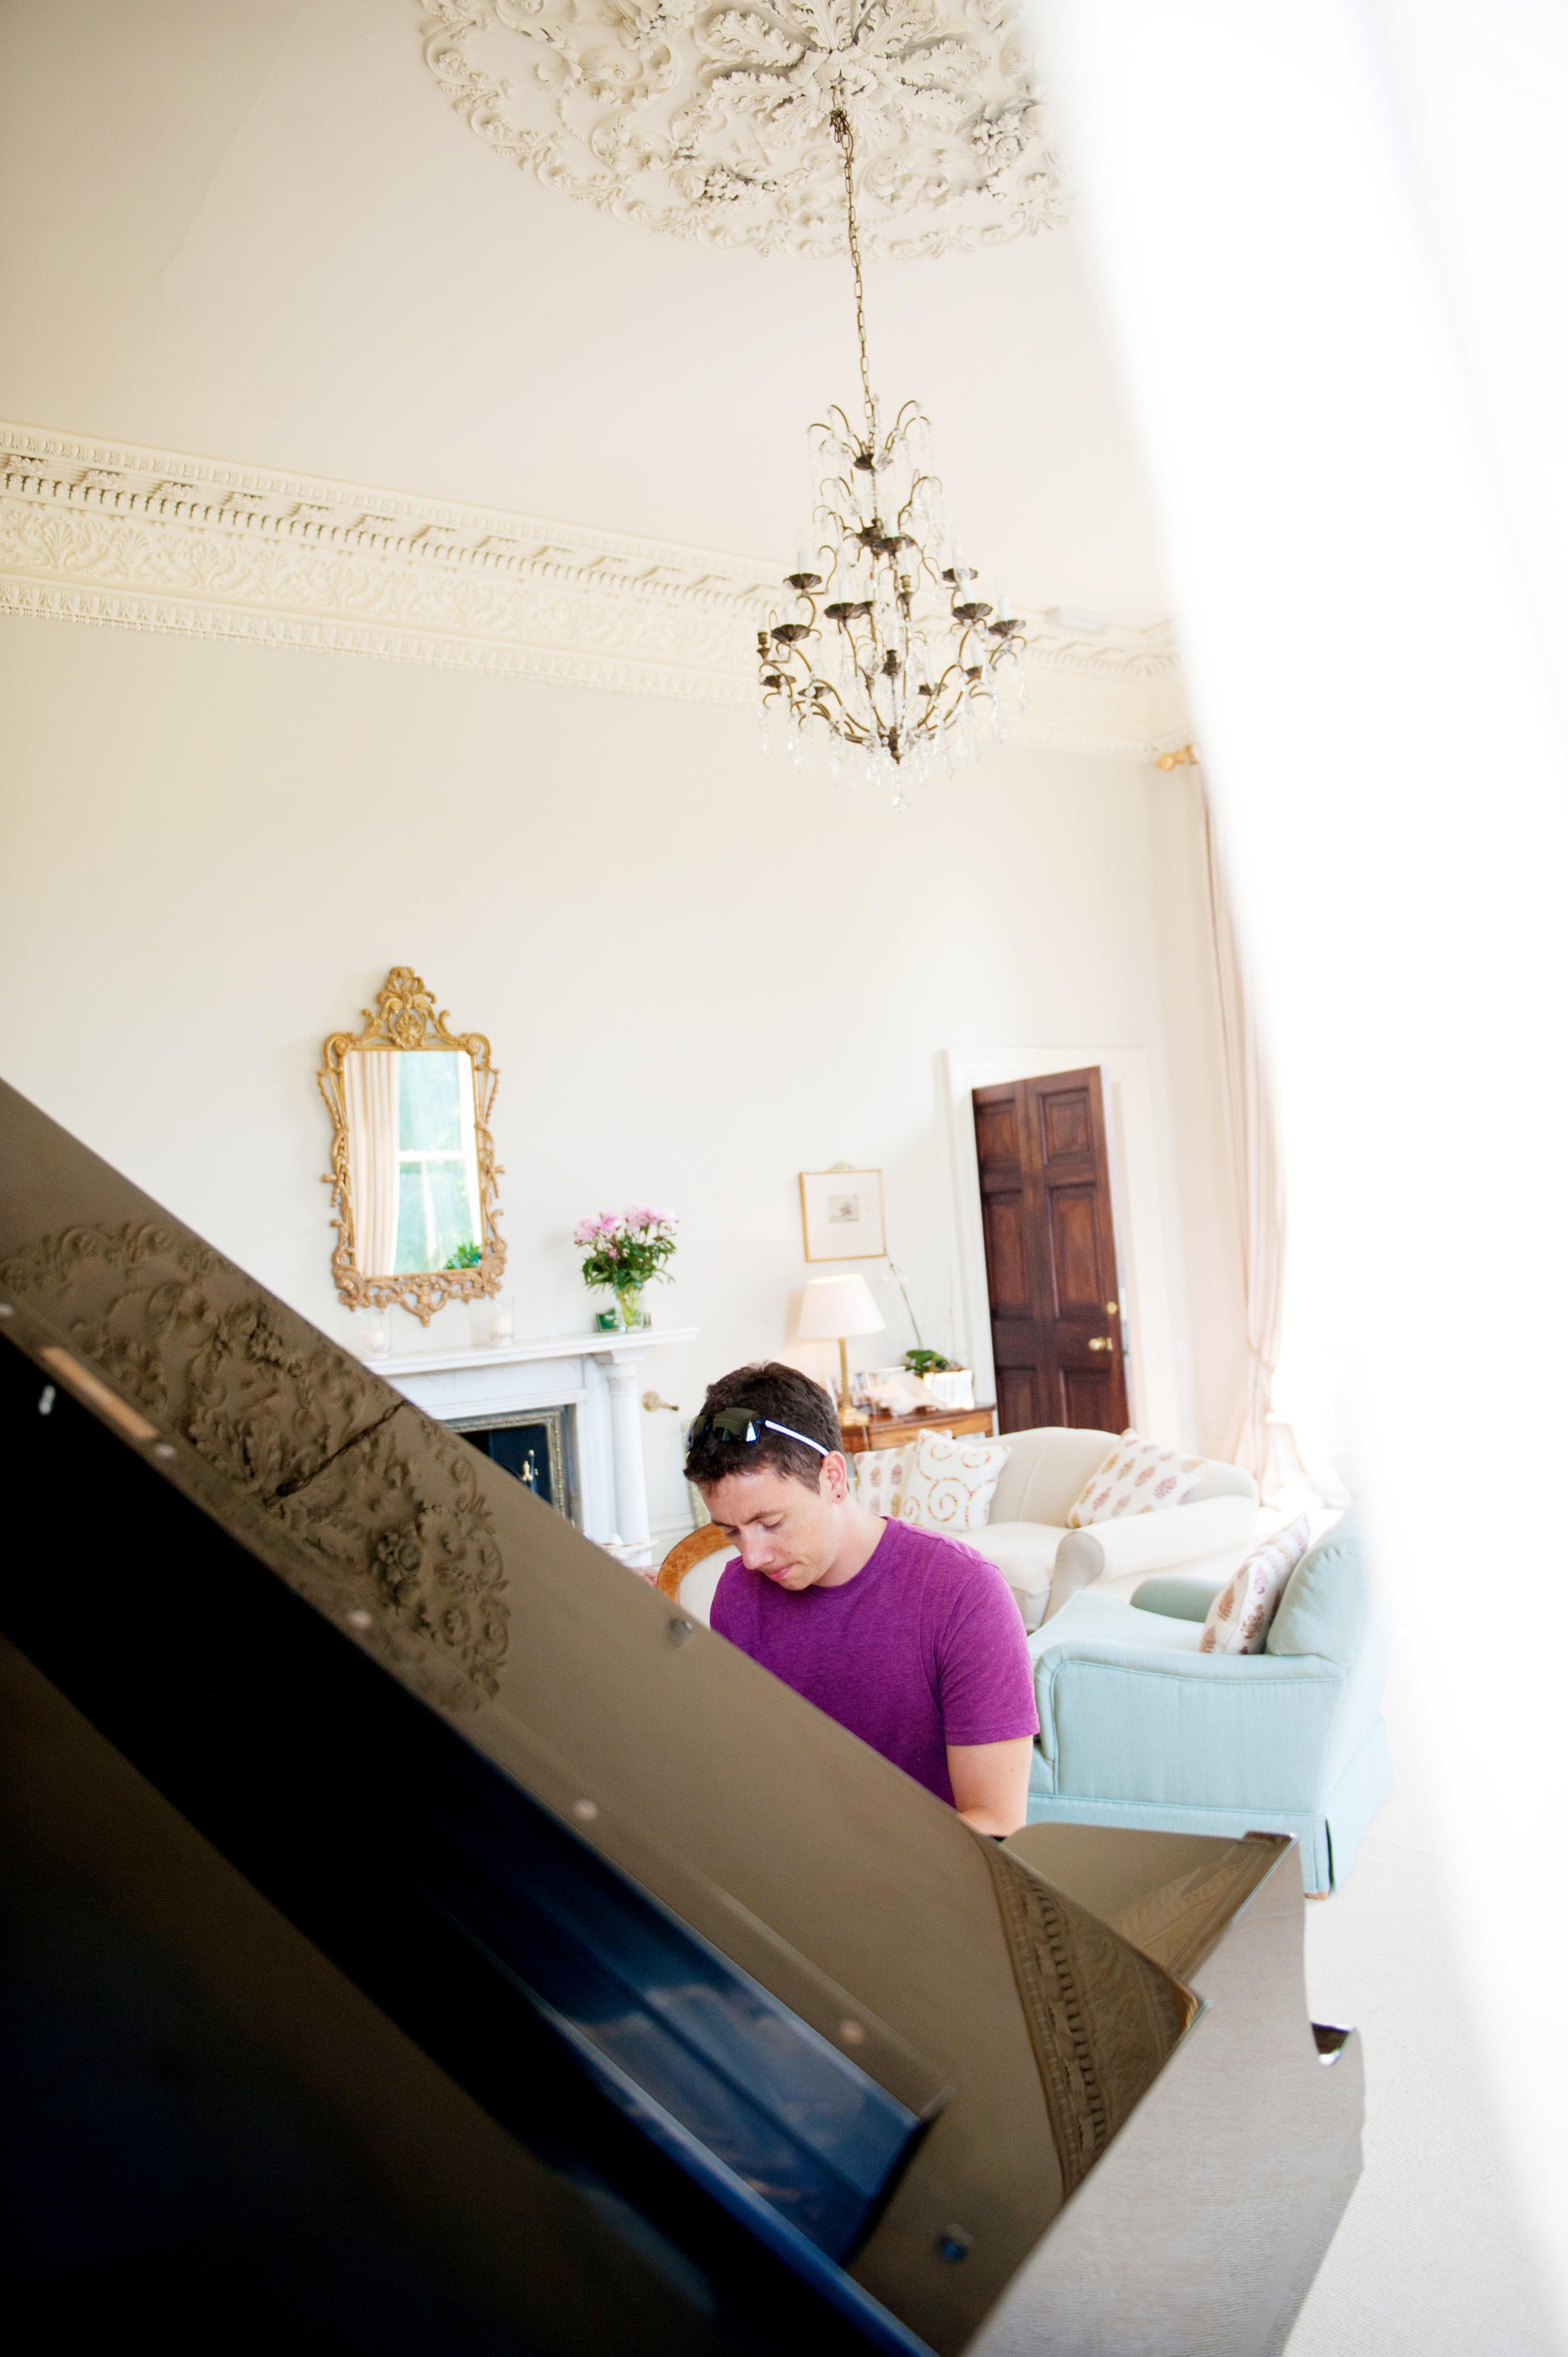 Kilshane House drawing room. -Photography:  Weddings by KARA  © - Wedding Location: Kilshane House, Tipperary, Ireland